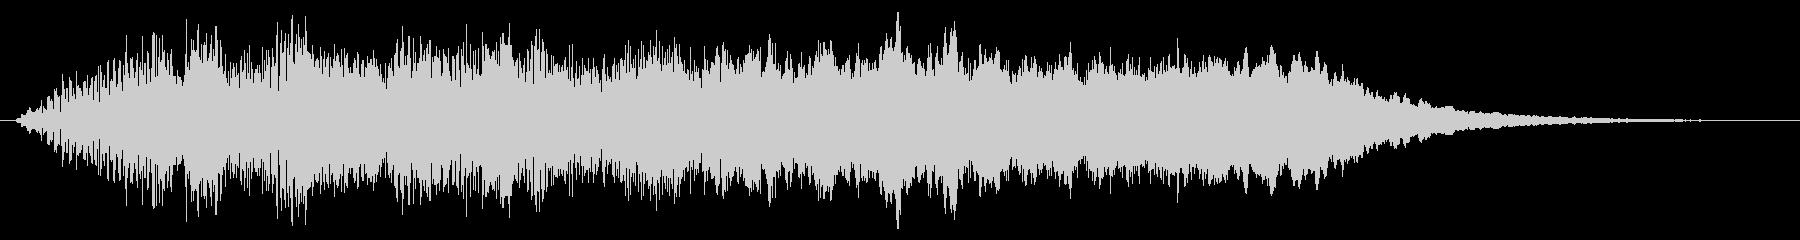 EDM系のDJ/音楽制作用フレーズ!03の未再生の波形